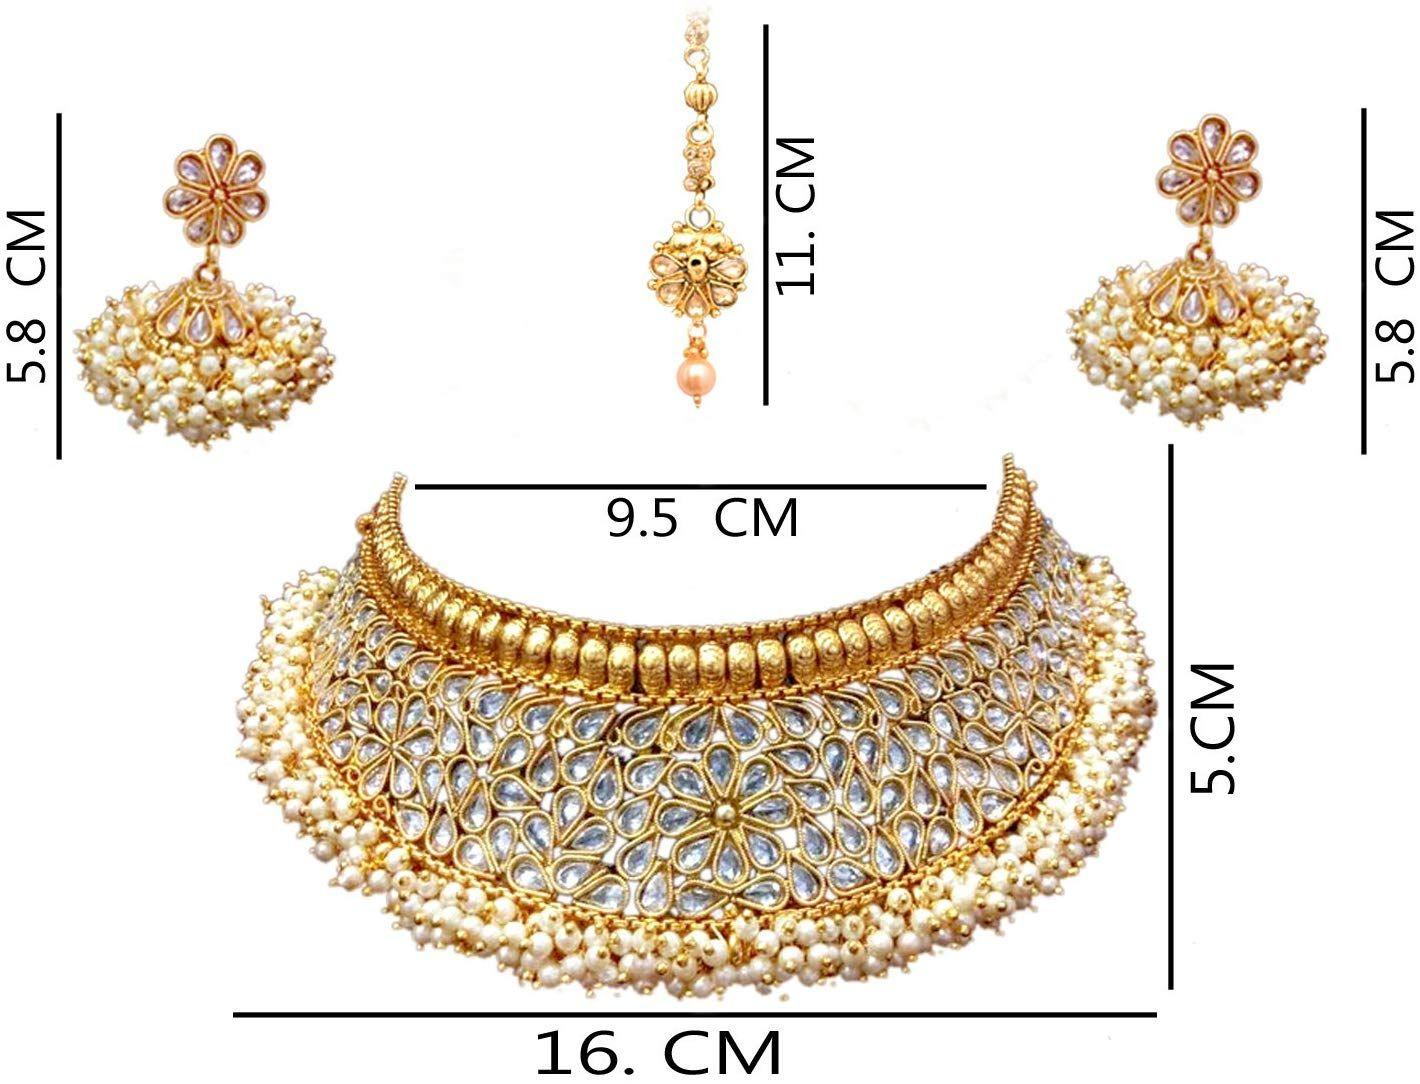 64a1dc3670a Buy Sitashi 18 K Gold Plated Antique Rajwadi Fashion Imitation Jewellery  Stone Choker Necklace Set